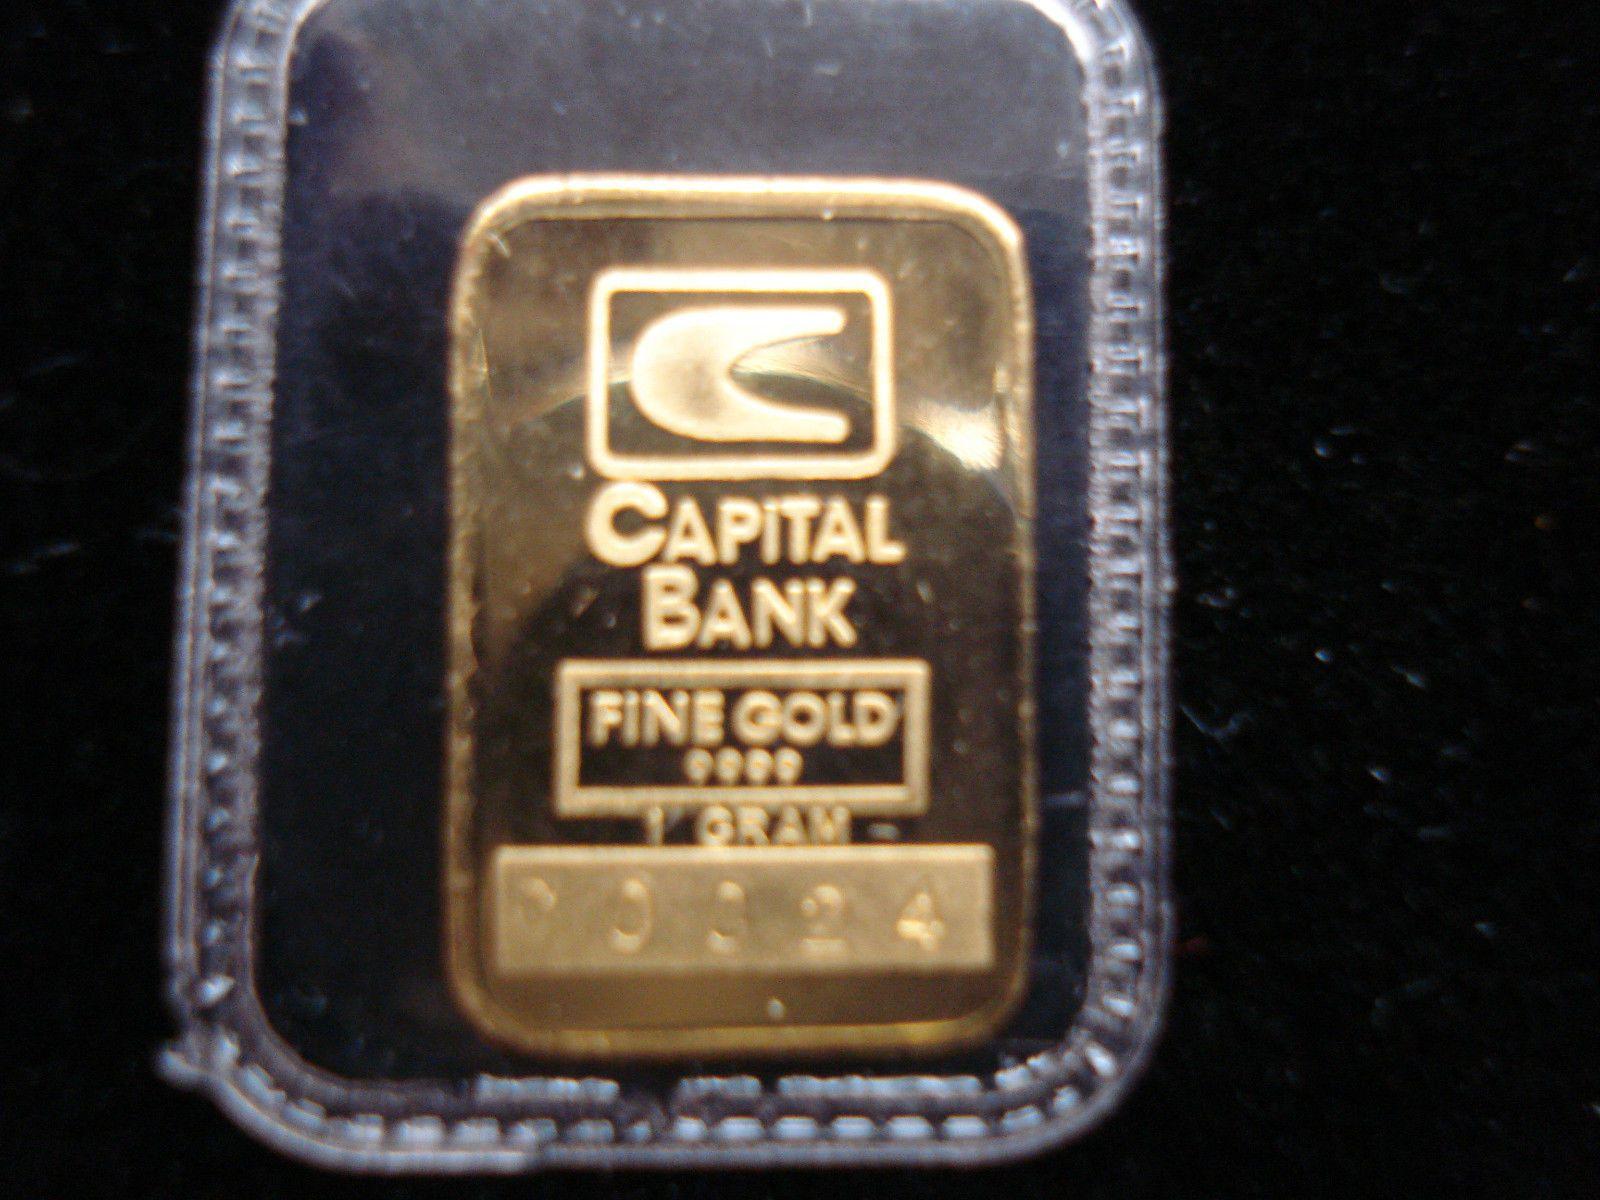 1 Gram Gold Johnson Matthey Capital Bank Bar Gold Precious Metals Bar